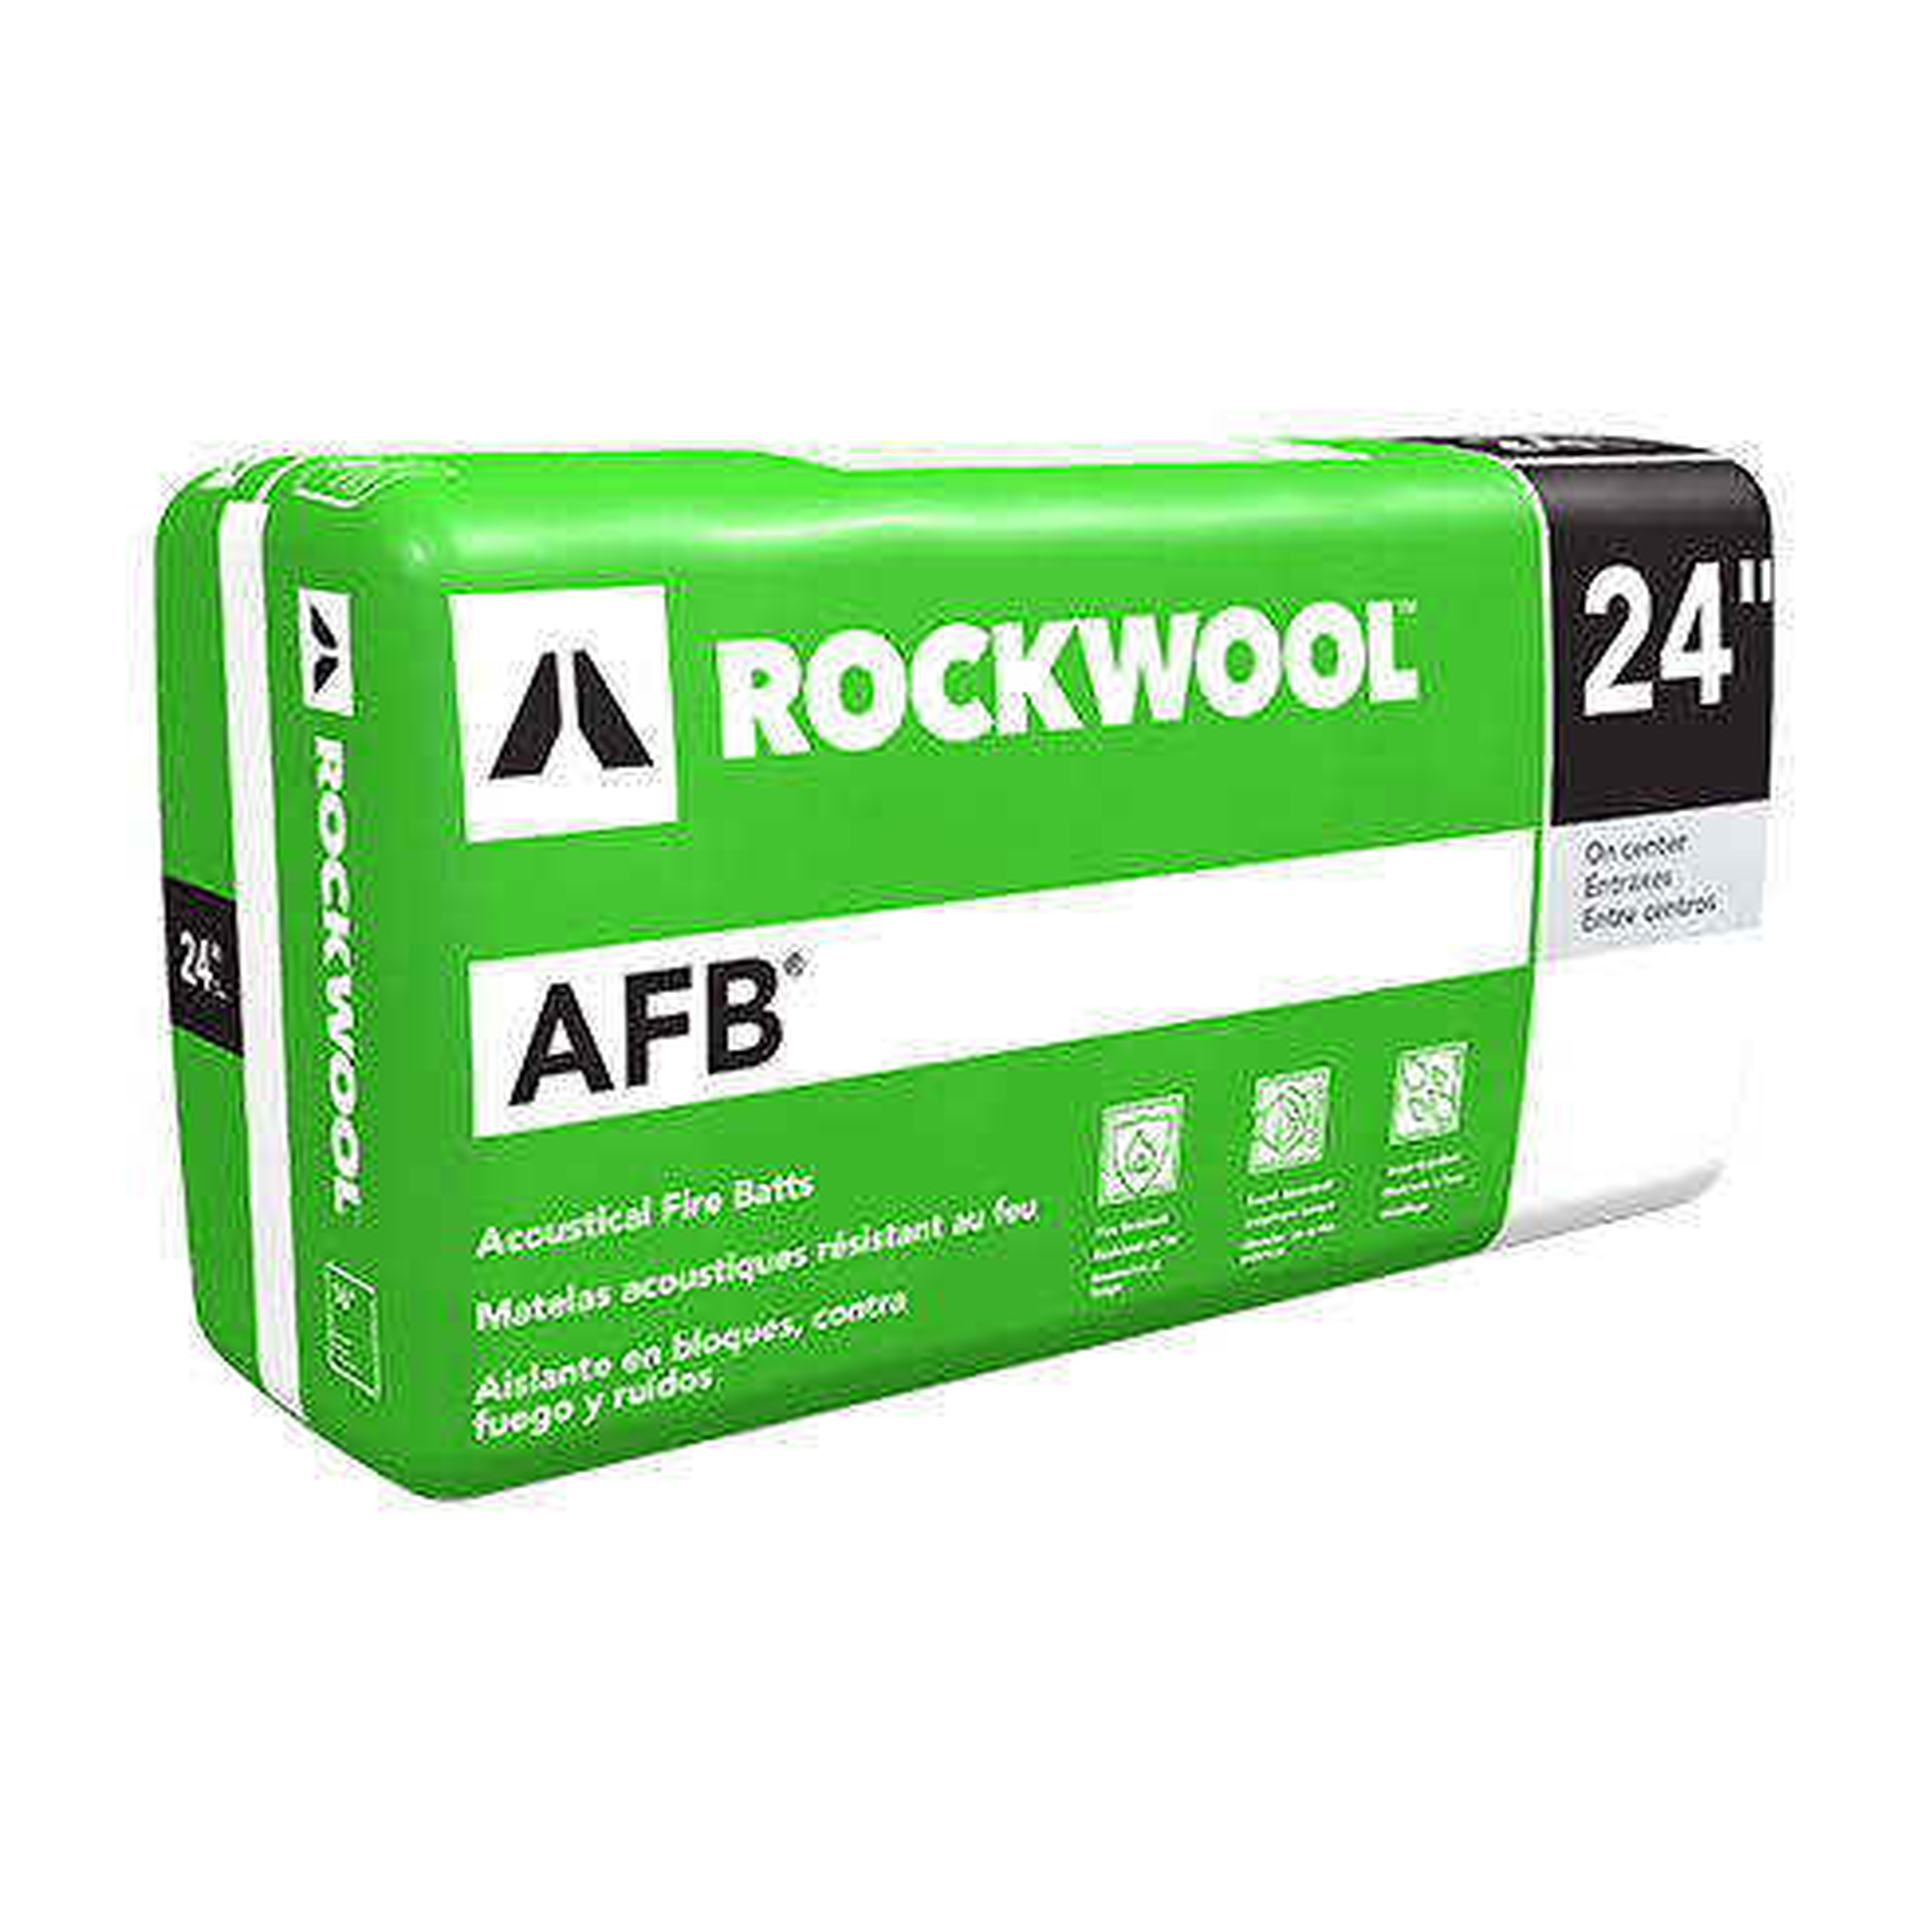 ROCKWOOL AFB